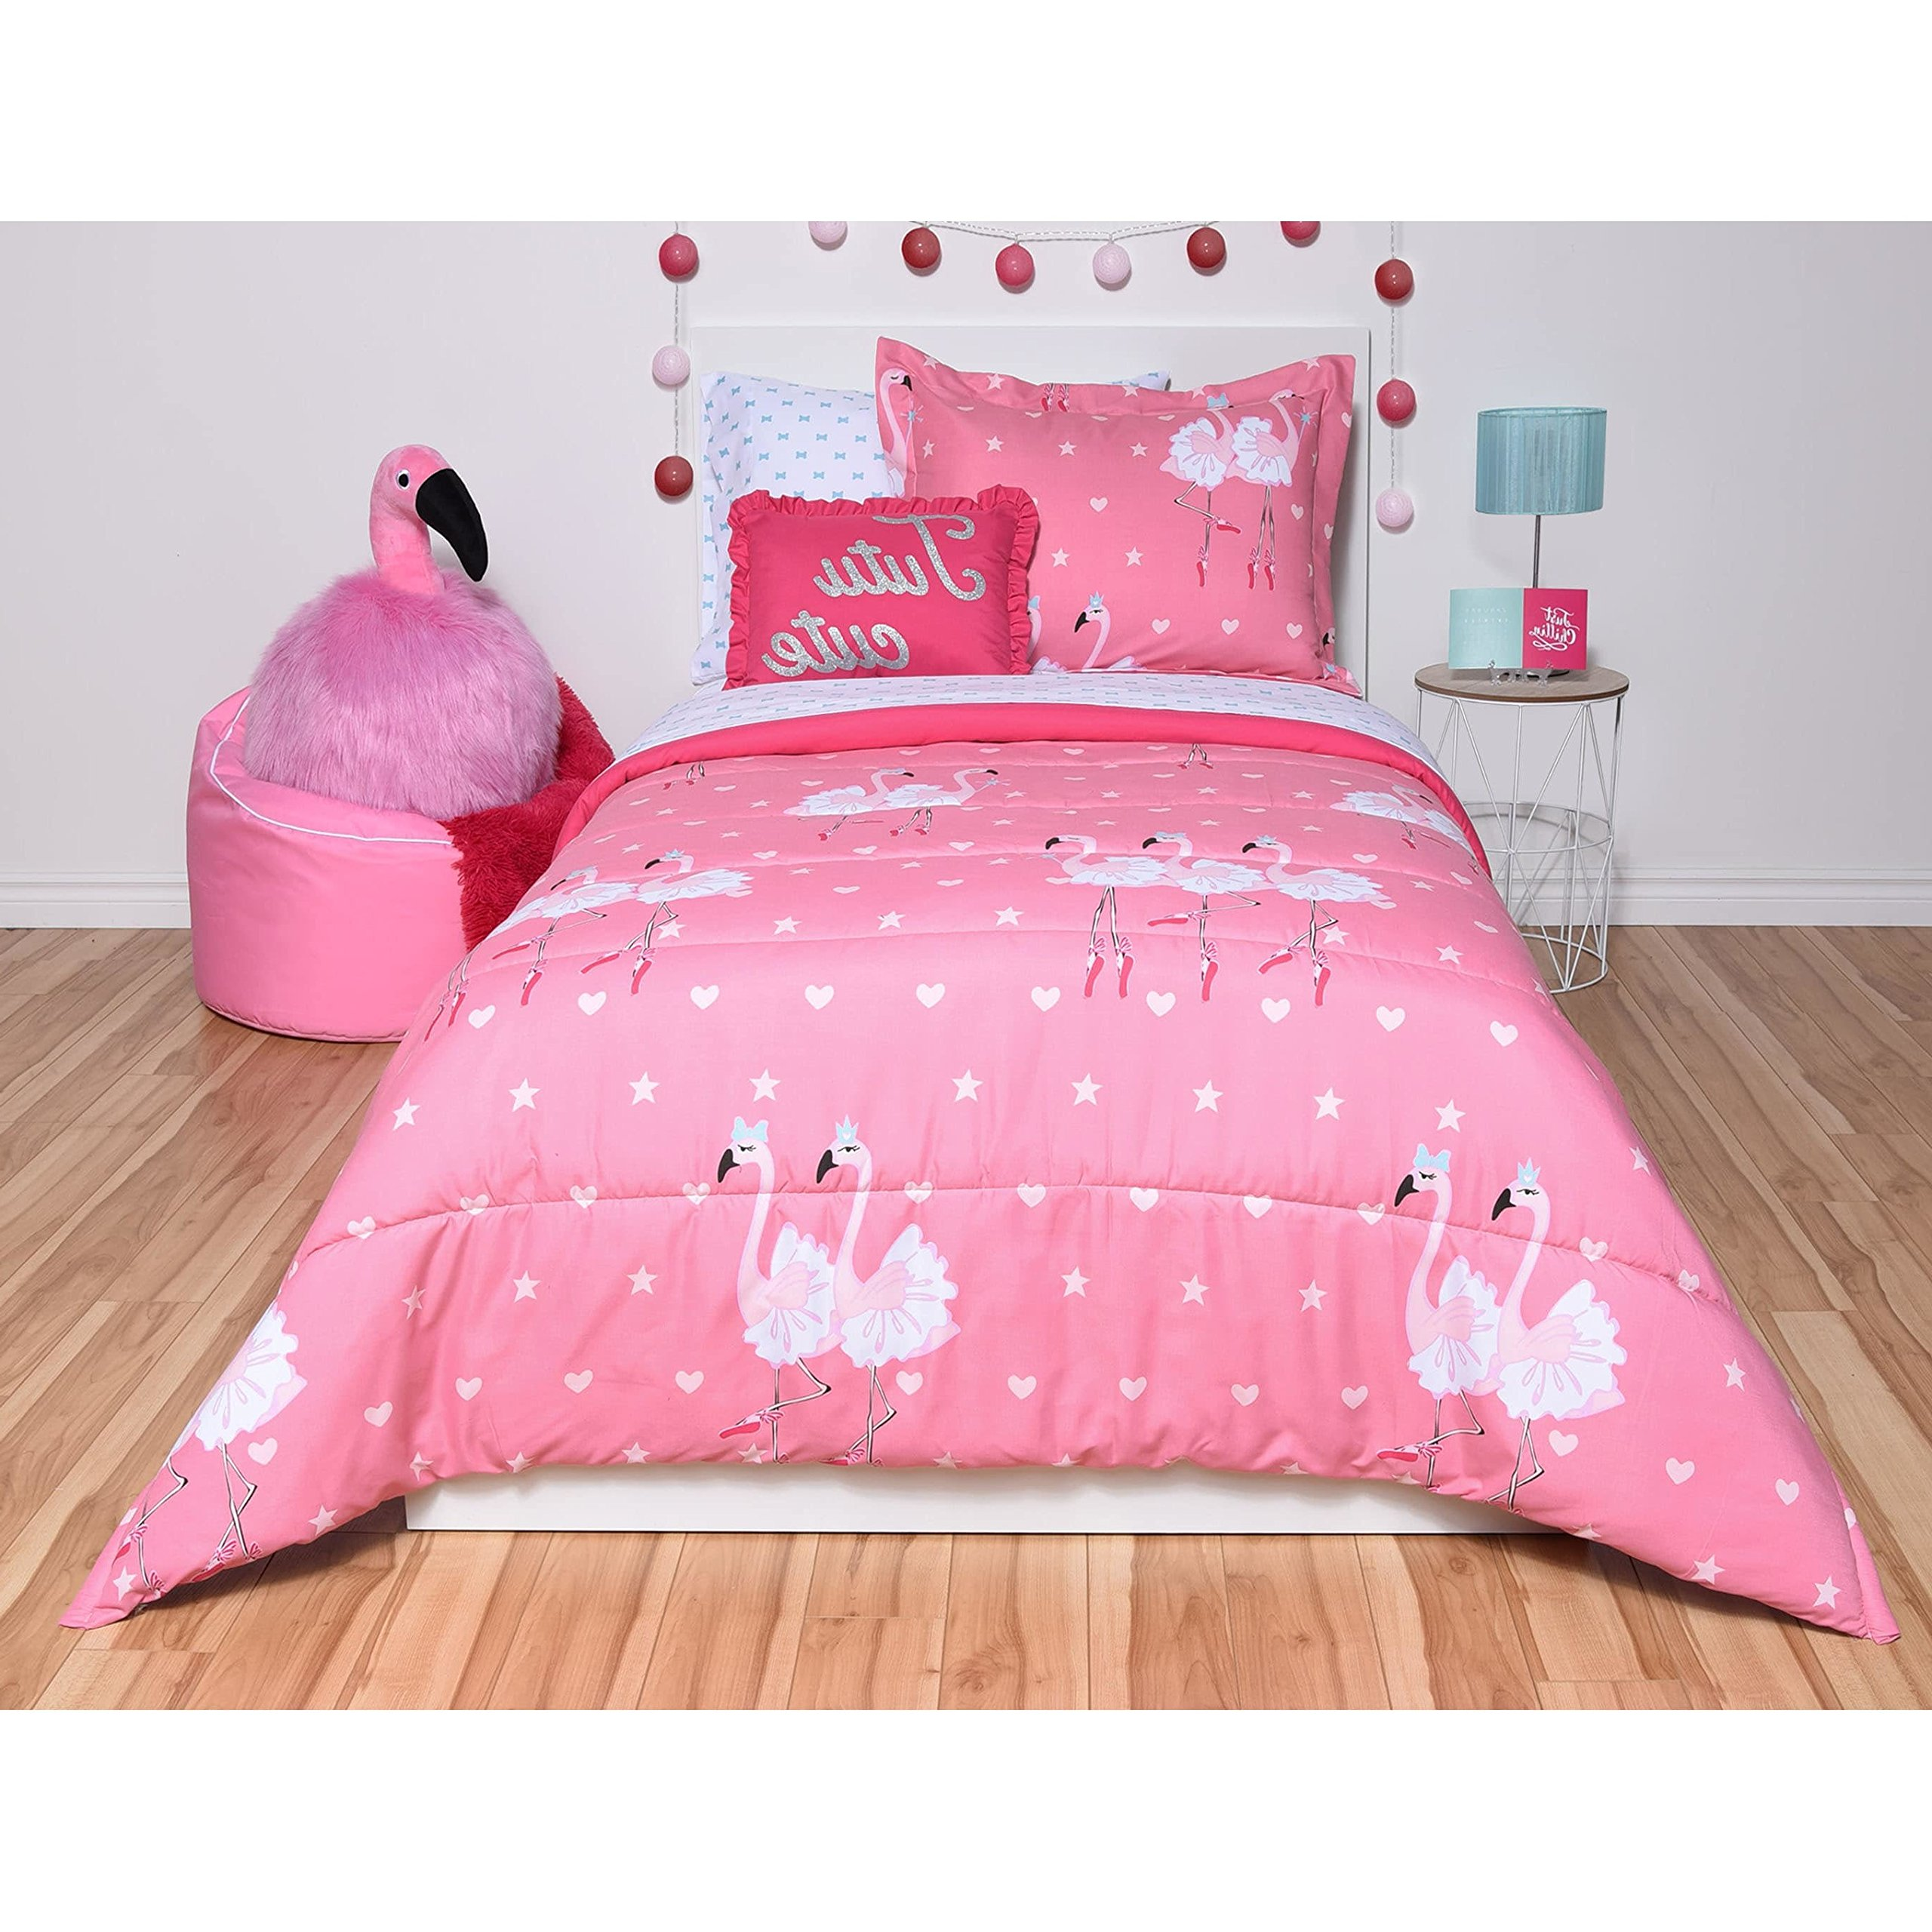 N-A 5 Piece Girls Hot Pink White Ballet Dancing Flamingoes Comforter Twin Set, Vibrant Multi Ballerina Dance ird Bedding, Cute All Over Shapes Star Heart Pattern, Microfiber